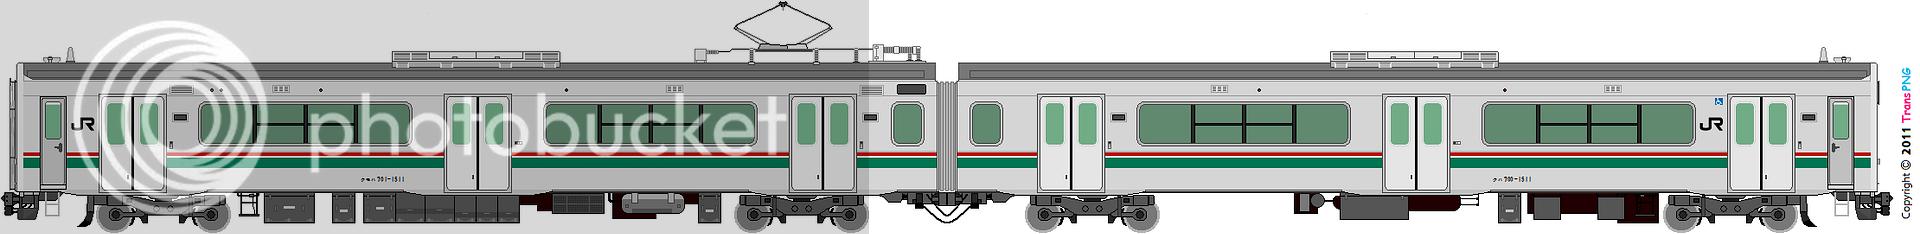 Train 2267